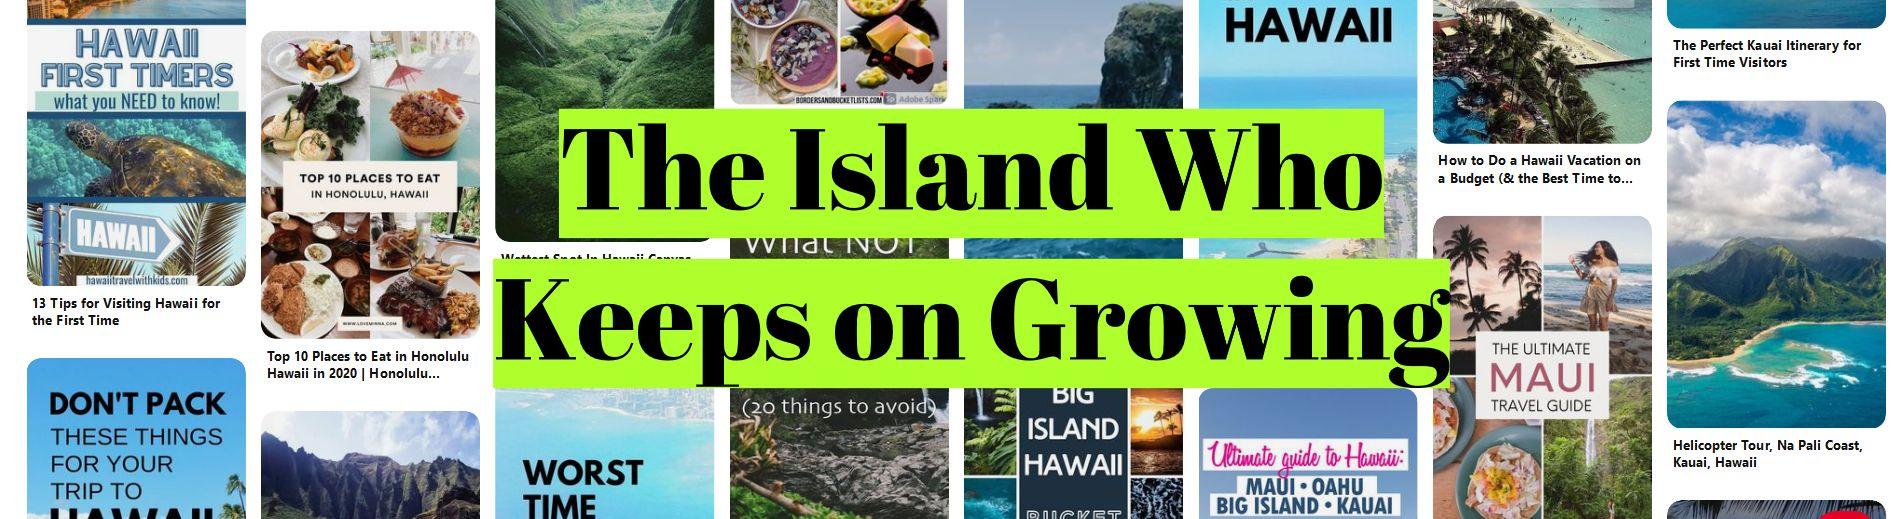 Hawaii - The Island Who Keeps on Growing